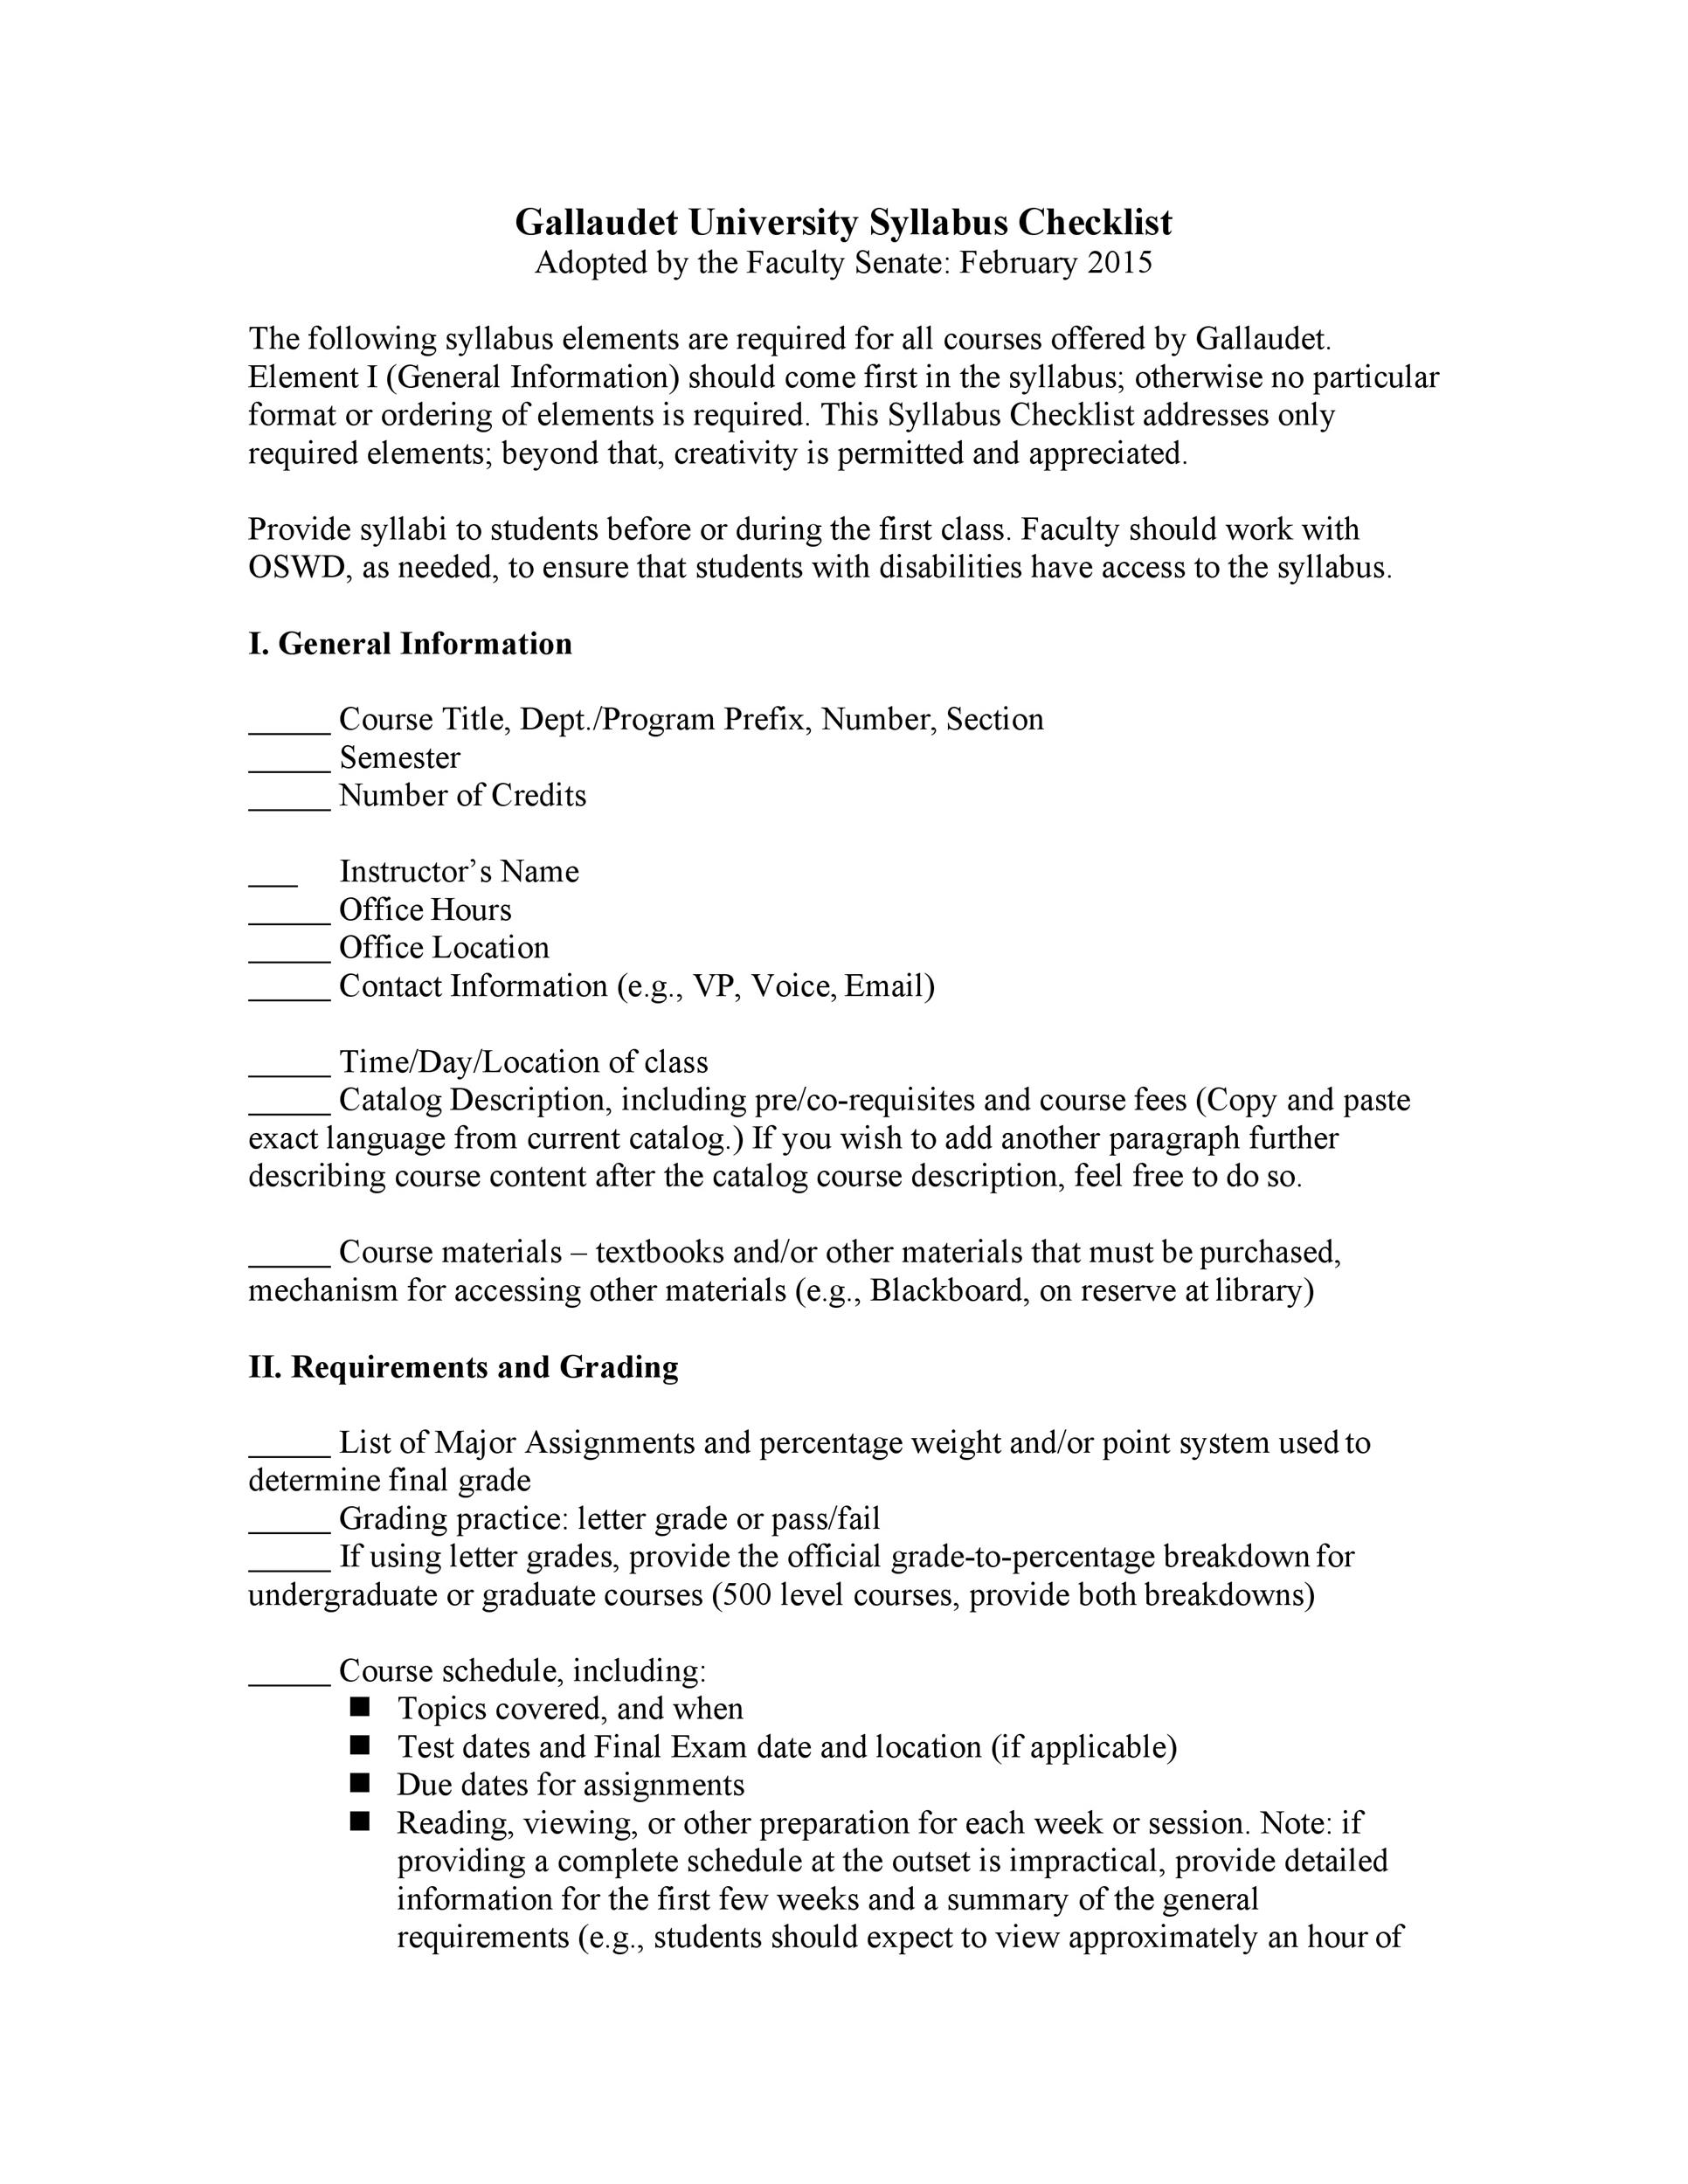 Free sylabus template 22